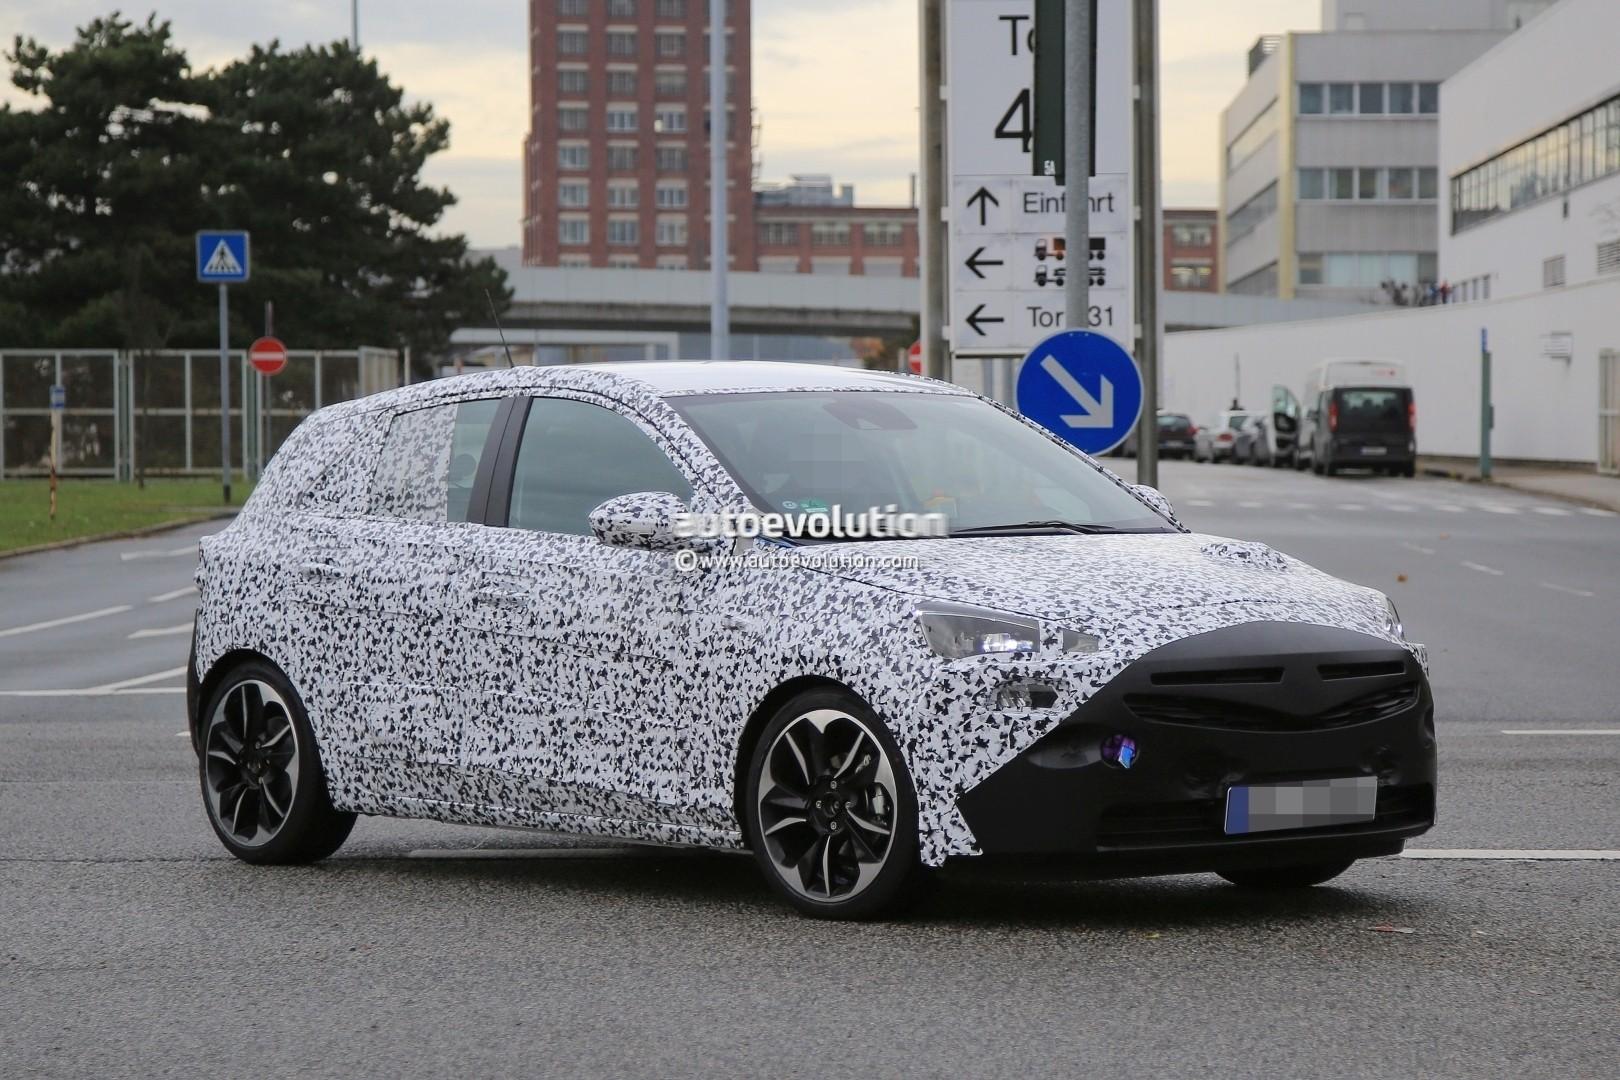 New 2018 Opel Corsa Spied Hiding Its Upmarket Design